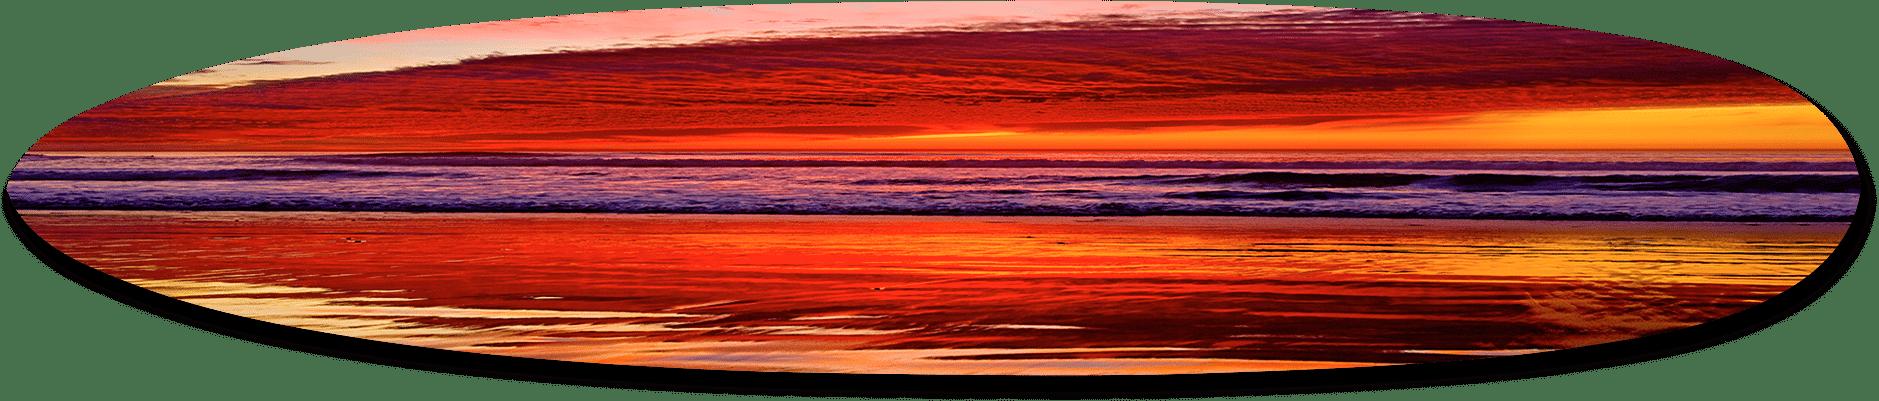 Seaside Sunset, California Long Board